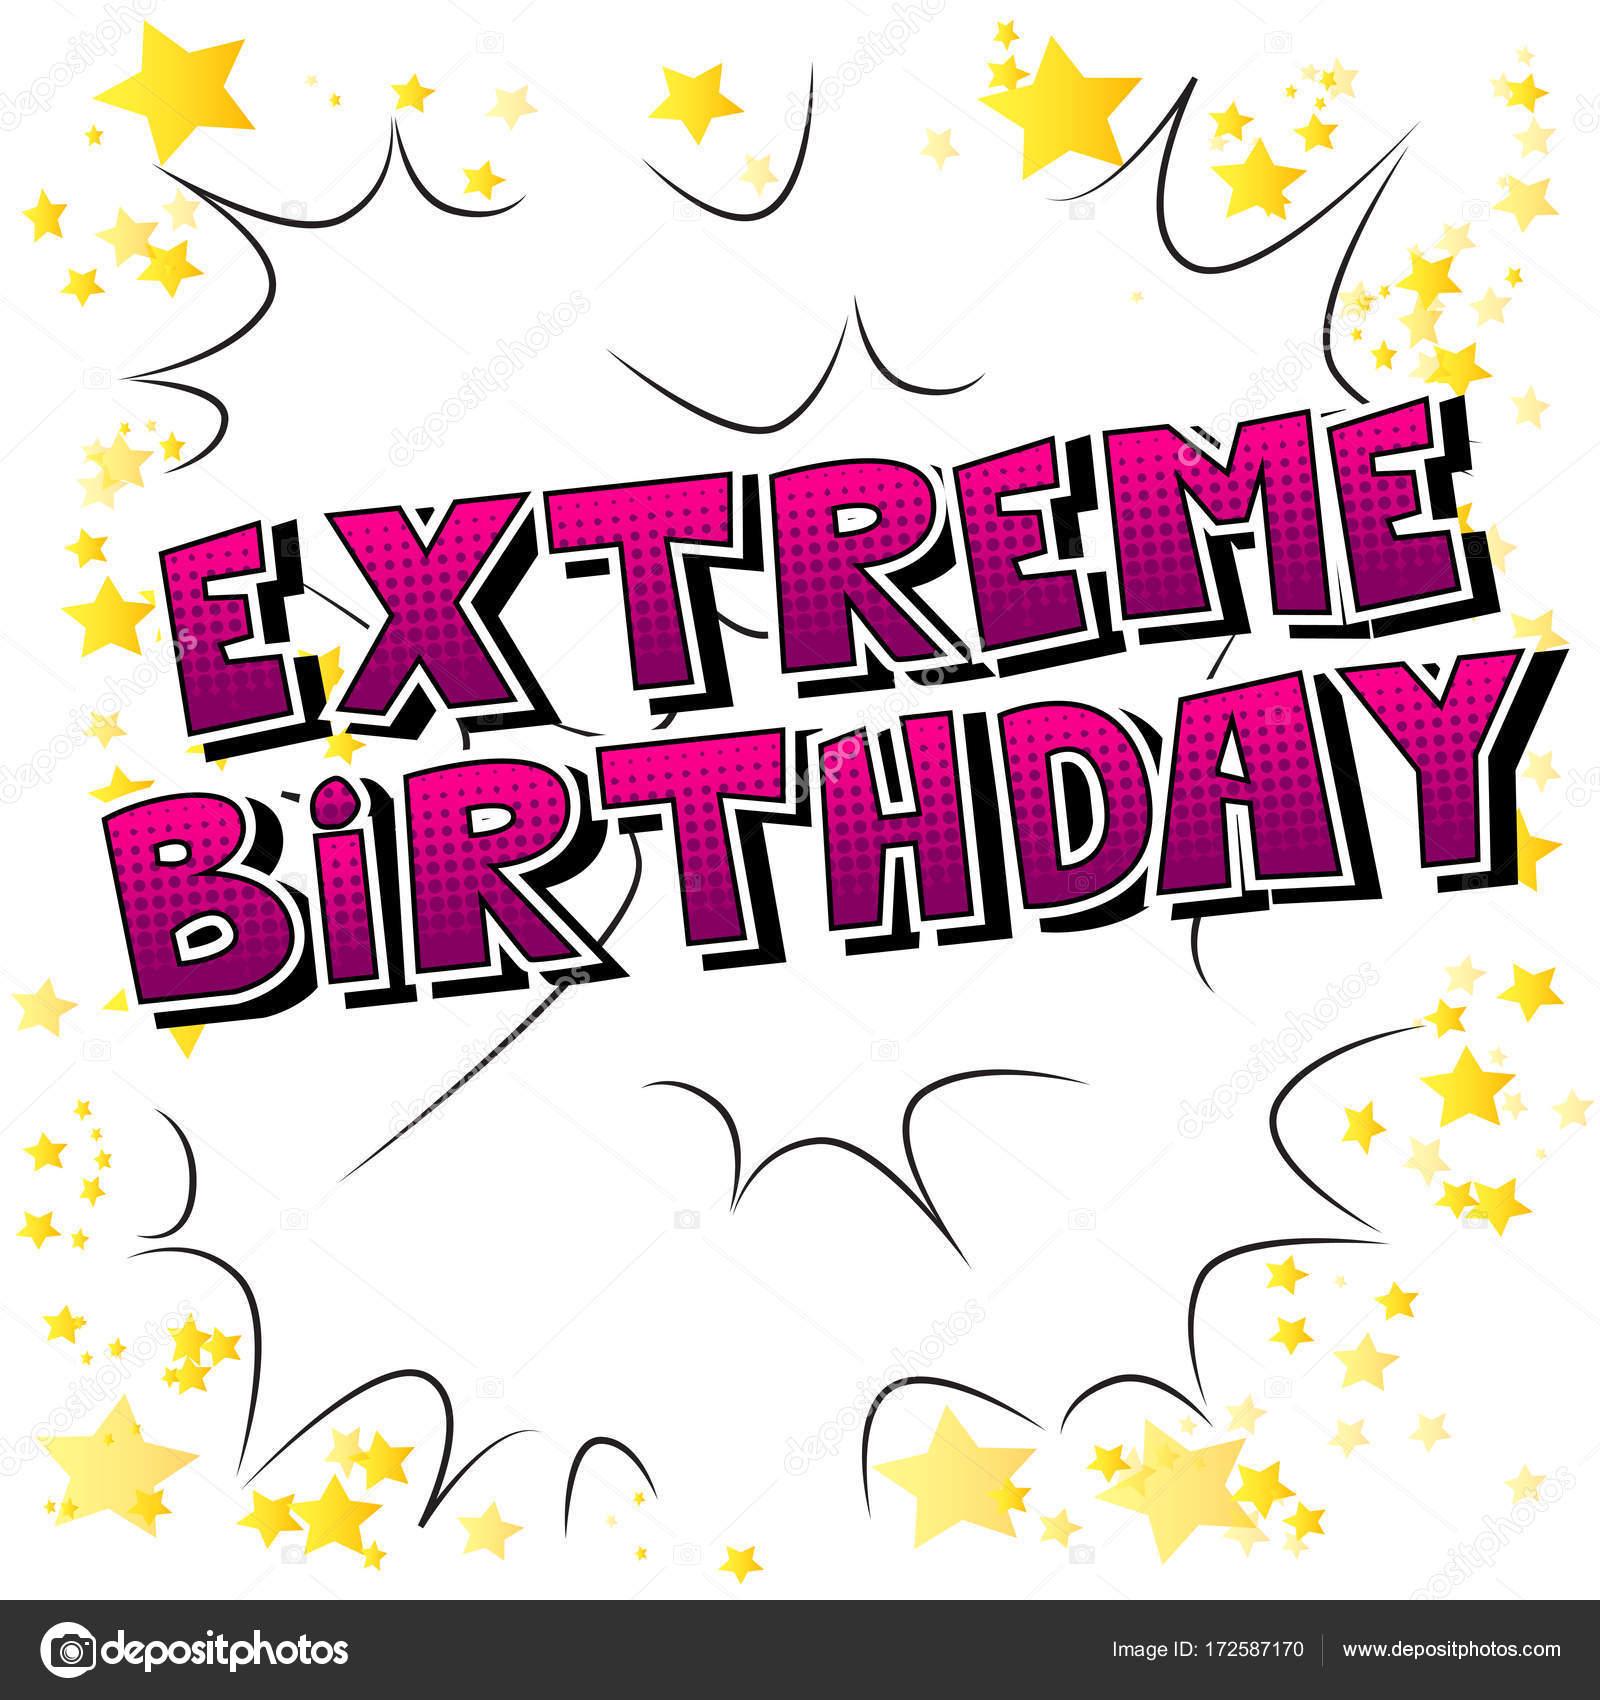 Extreme Geburtstag Comic Buch Stil Wort Stockvektor C Noravector